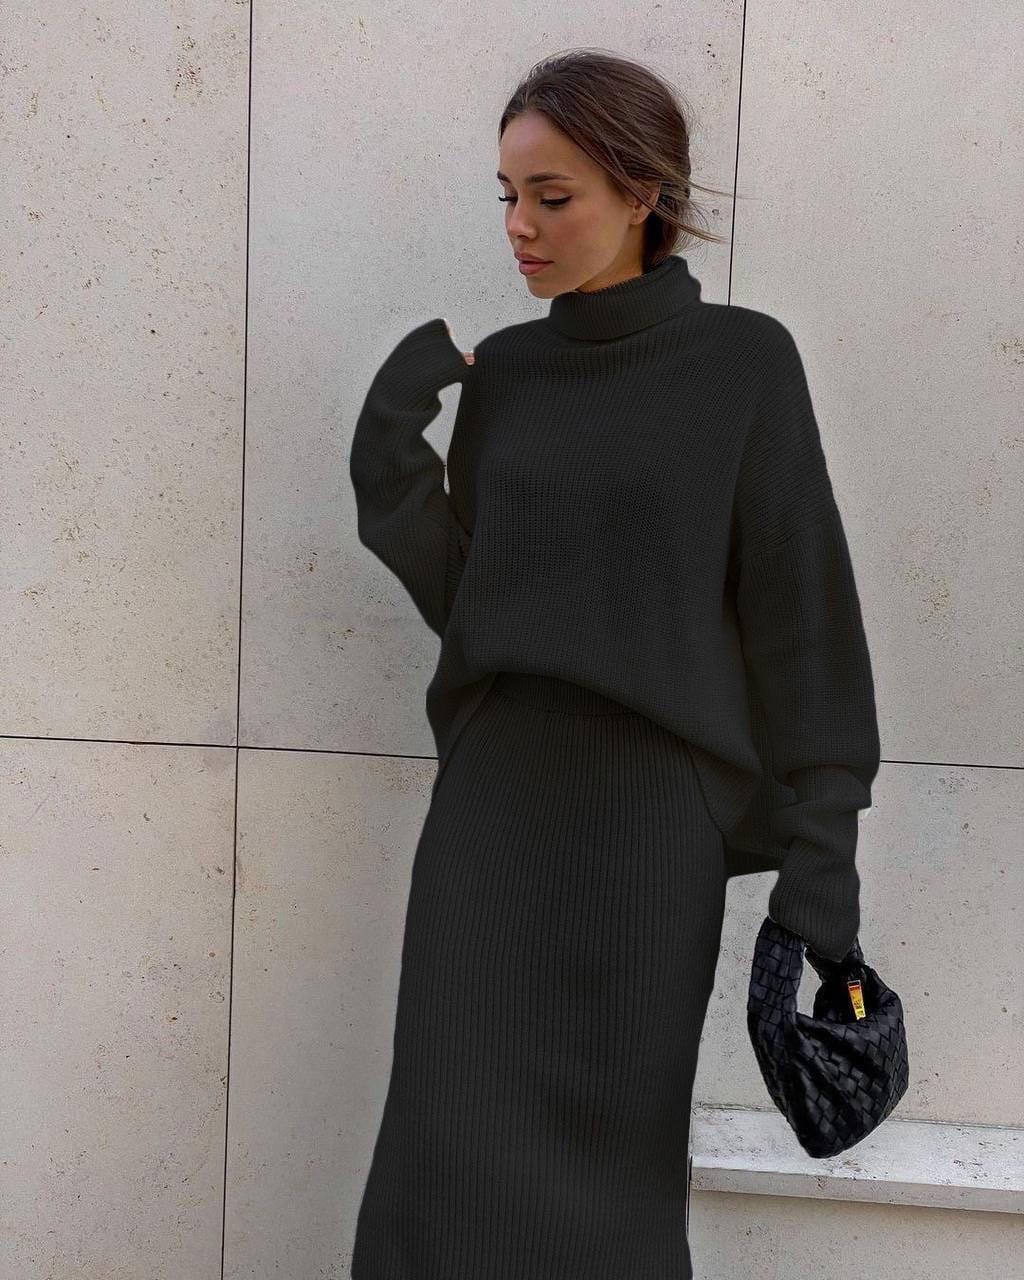 Жіночий костюм, ангора-рубчик, р-р 42-44; 46-48 (чорний)